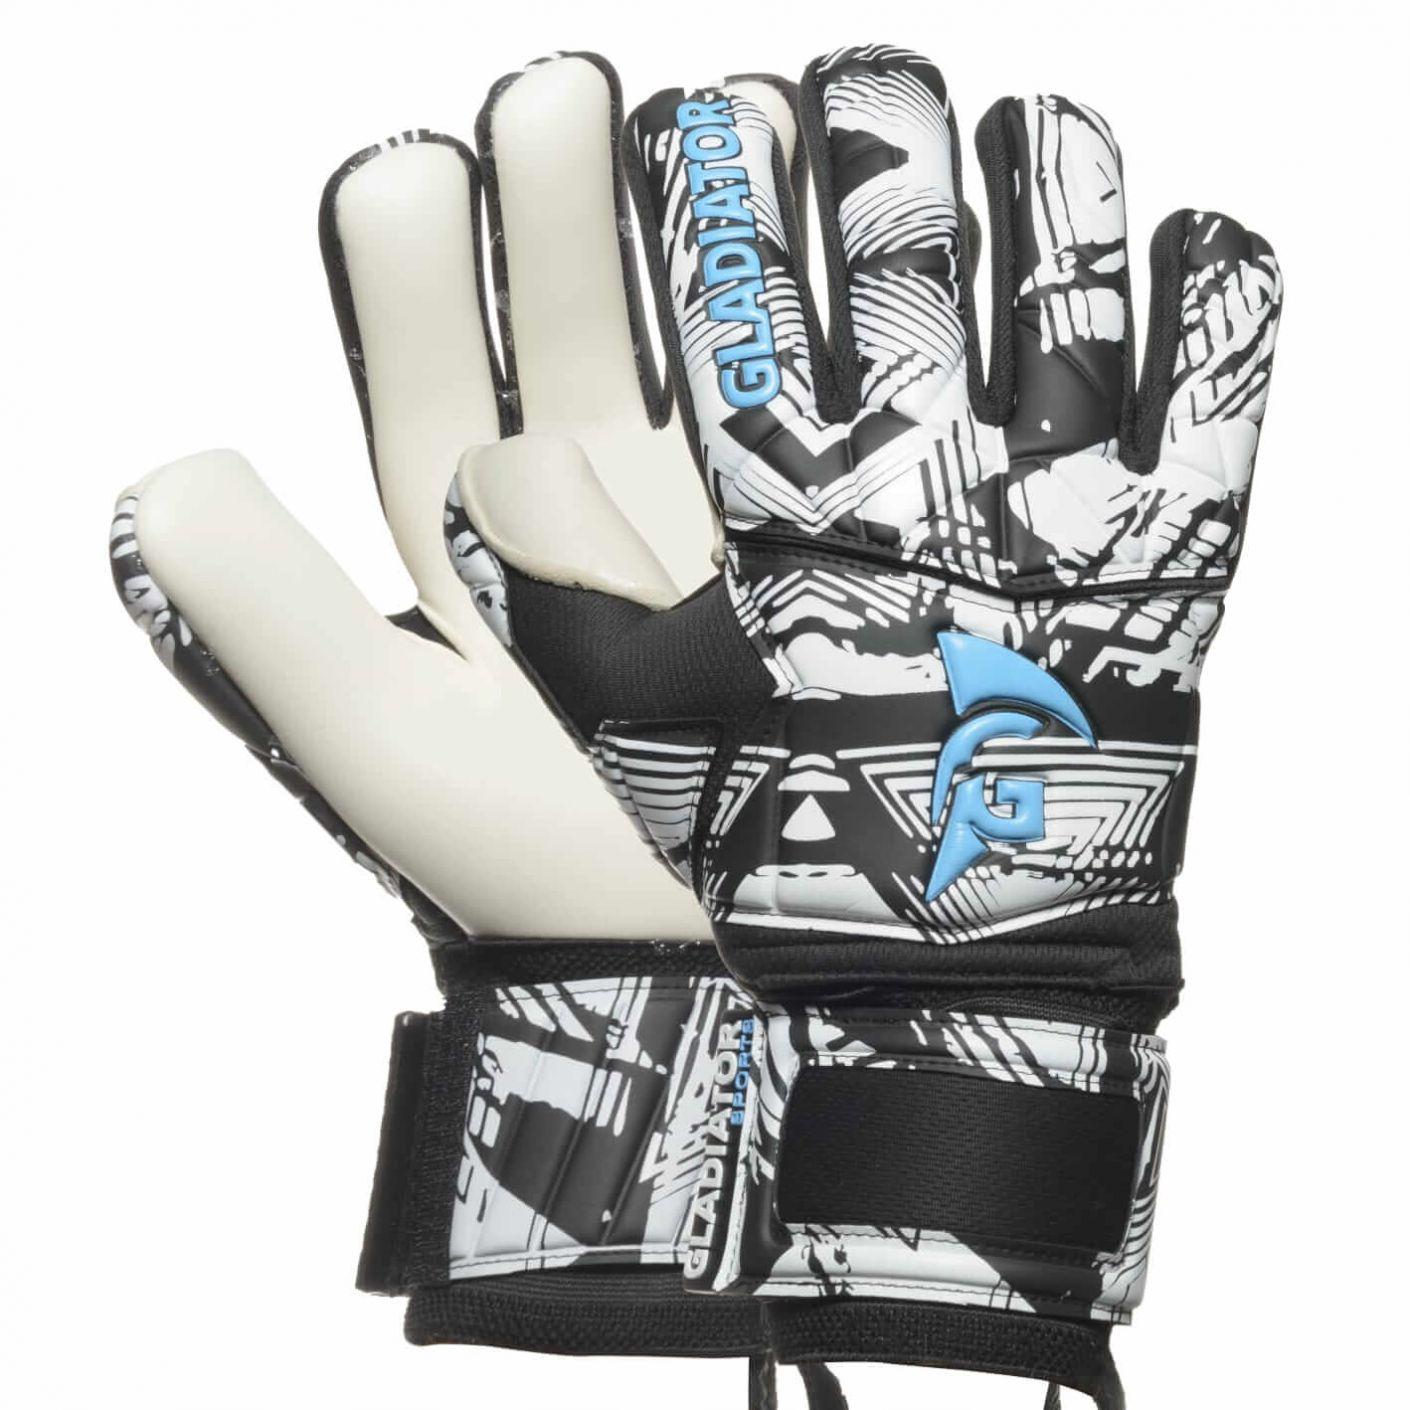 Gladiator Sports Keepershandschoenen Dazzle 3 Zwart Blauw Grijs